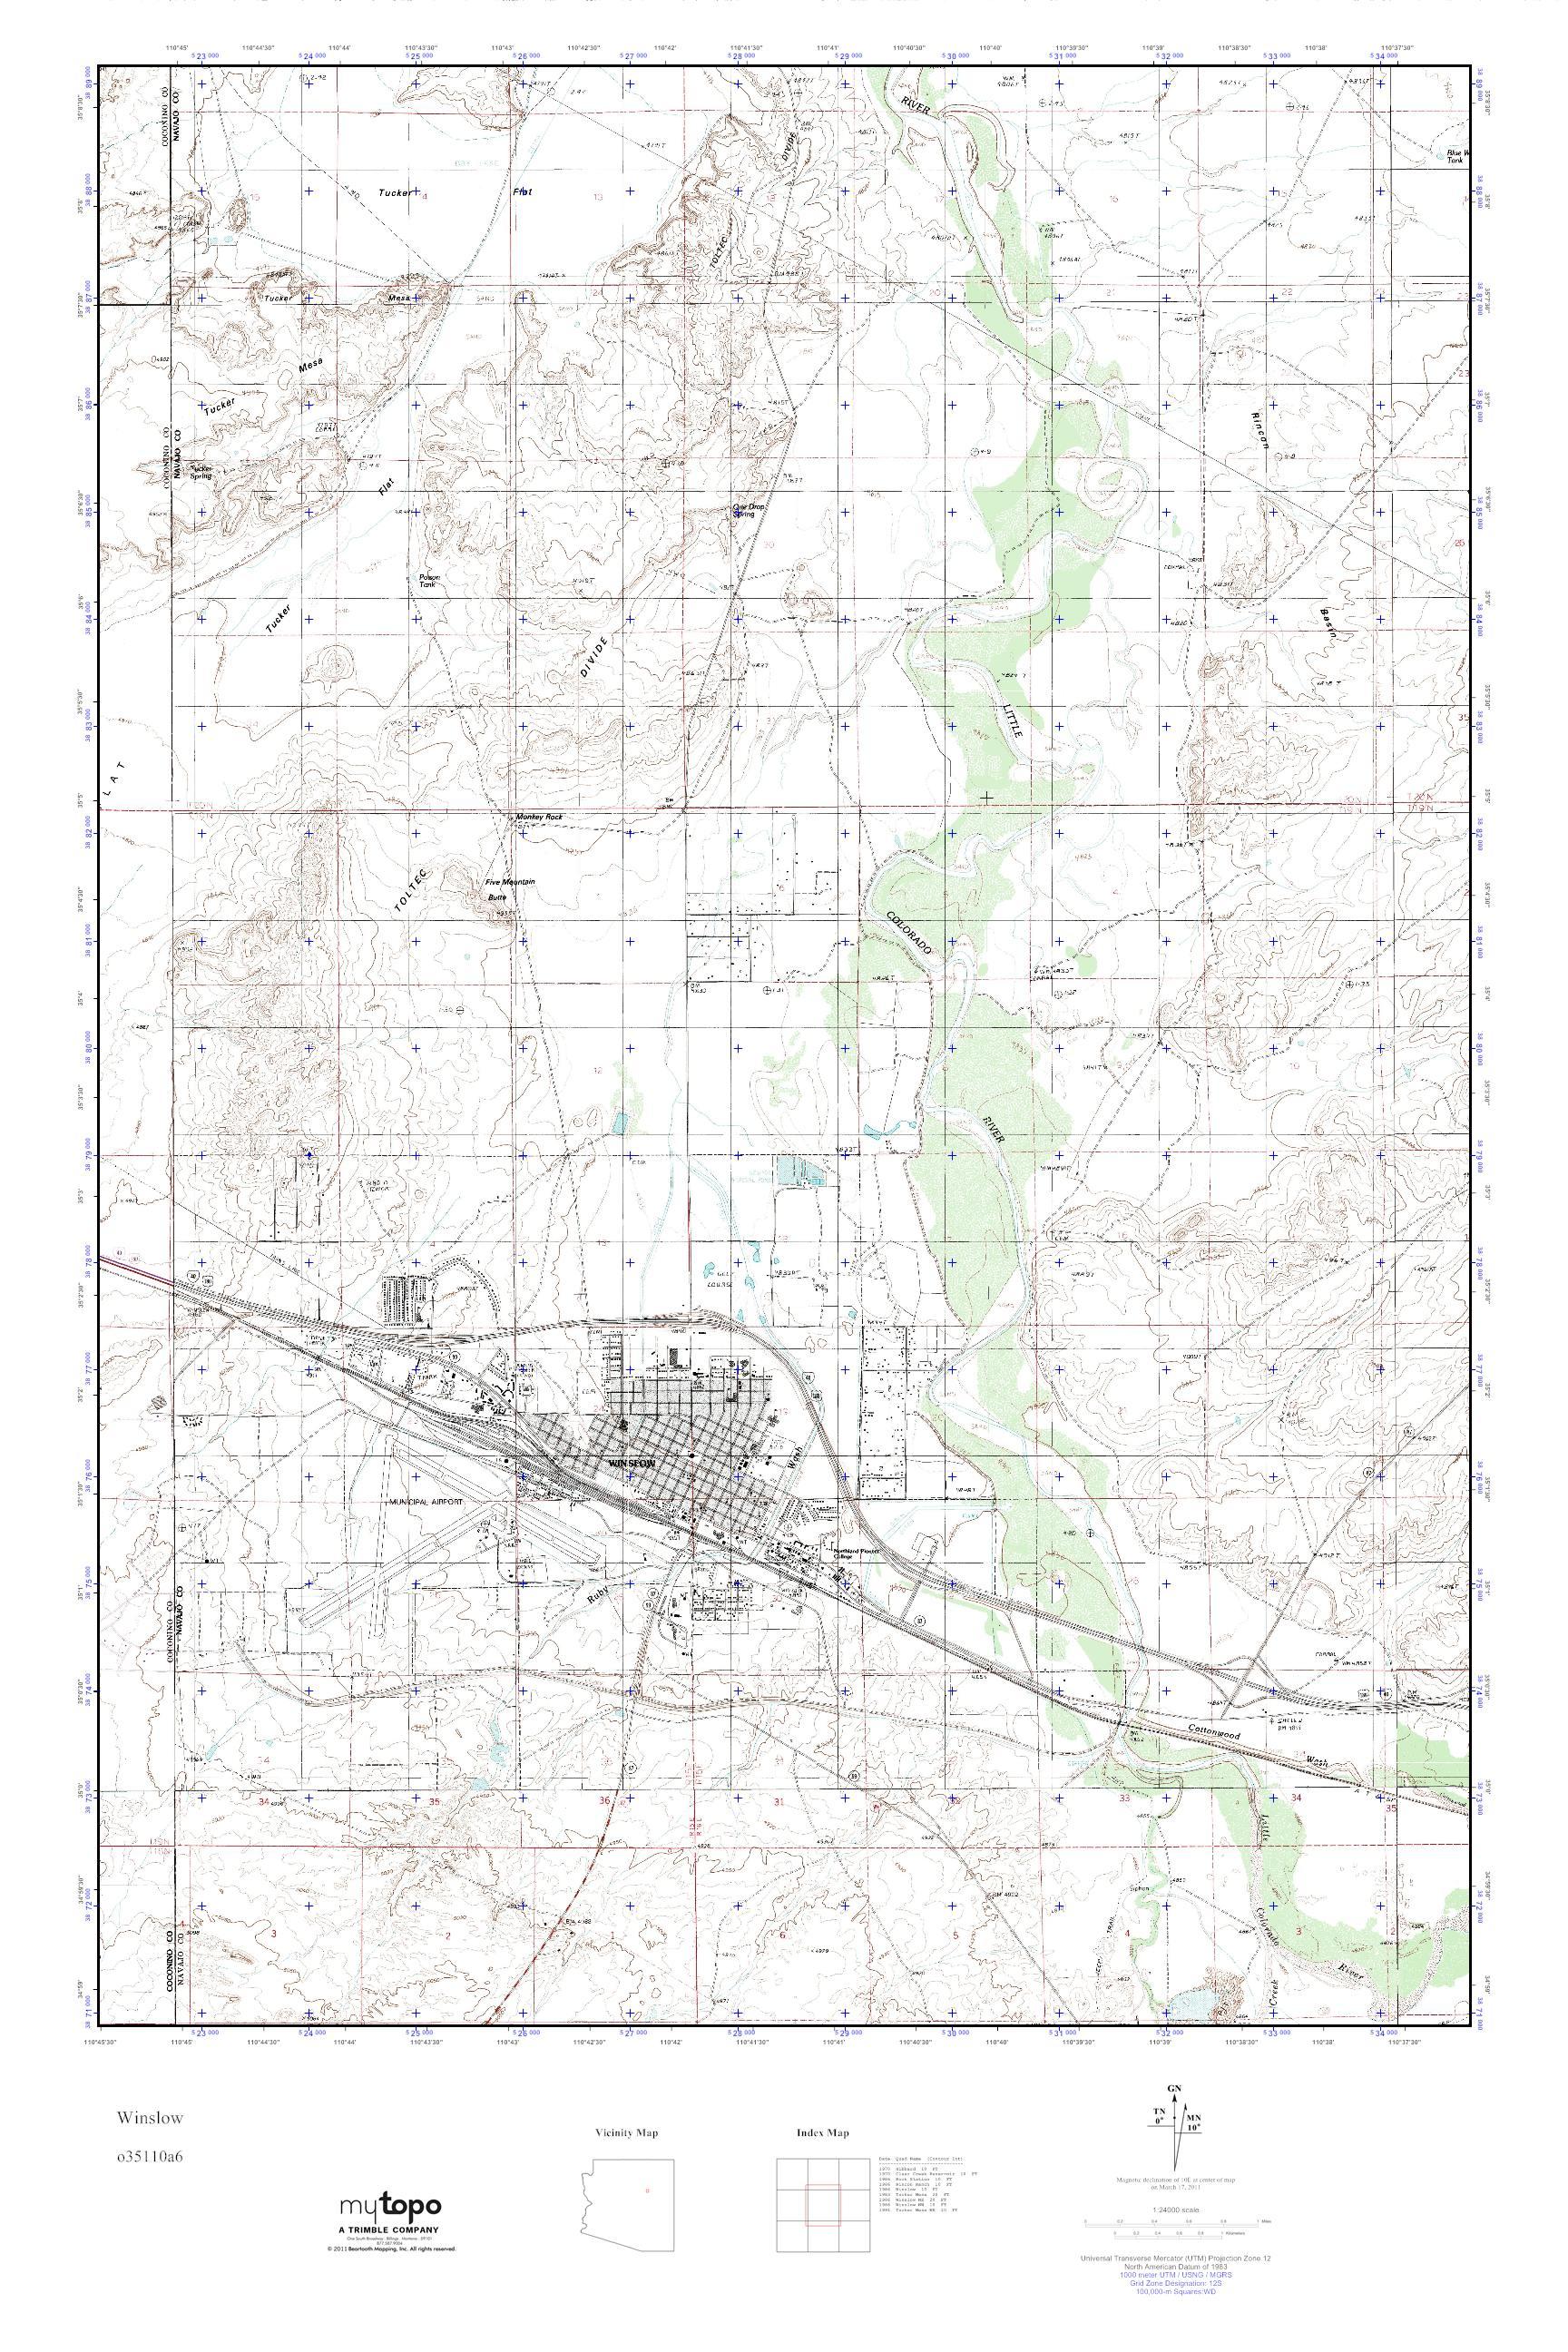 Mytopo Winslow Arizona Usgs Quad Topo Map